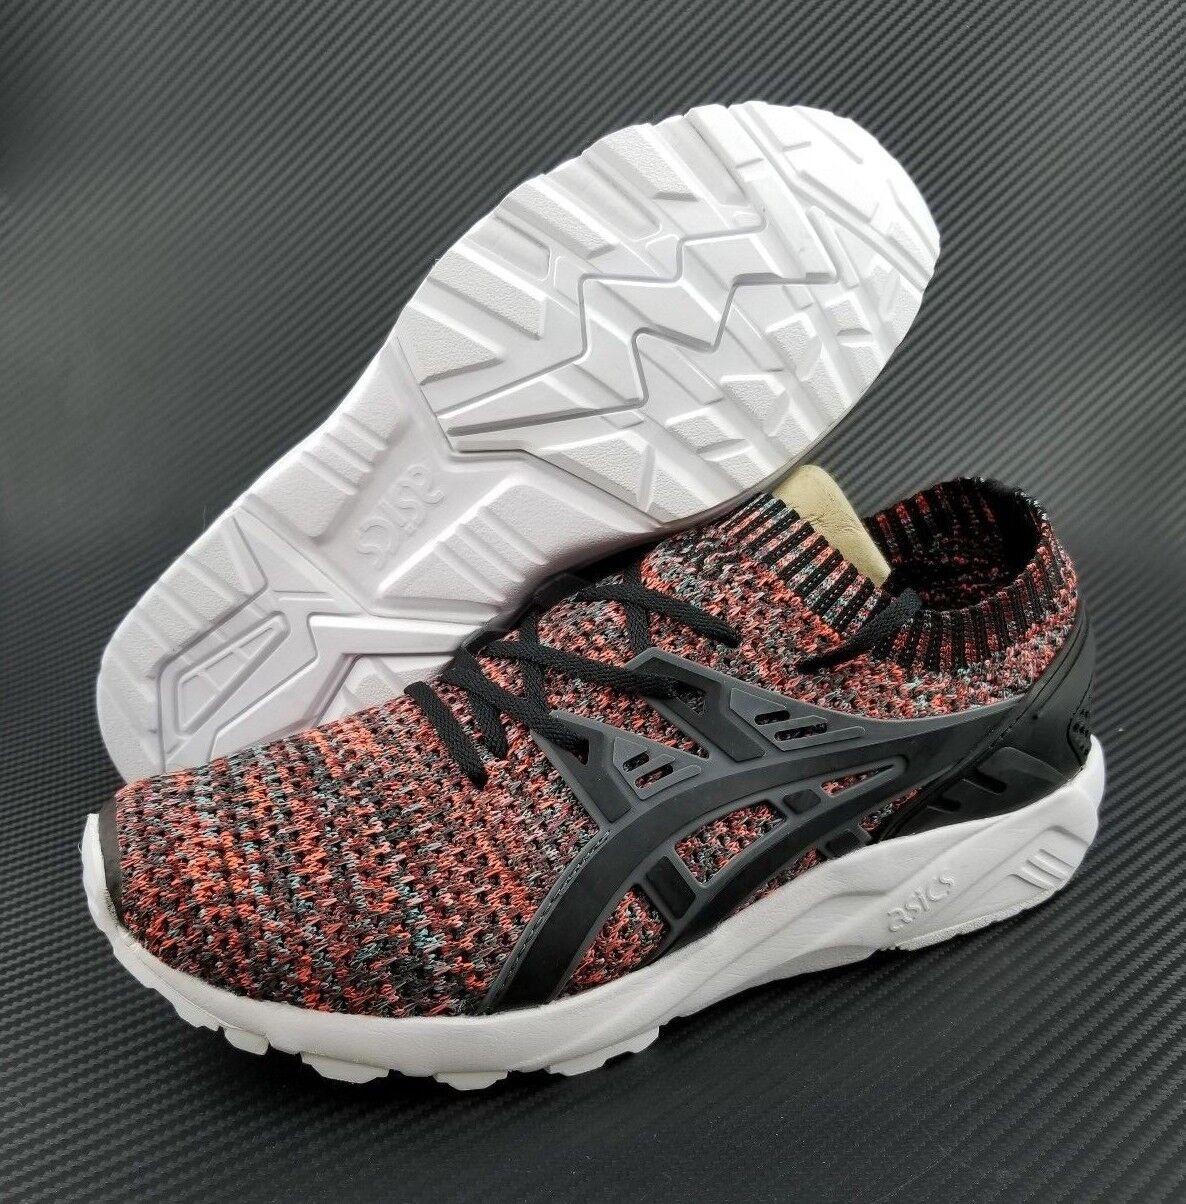 NEW ASICS Tiger Gel Kayano Size Shoes 8 Men's Knit Running Shoes Size HN7Q4 69dda5